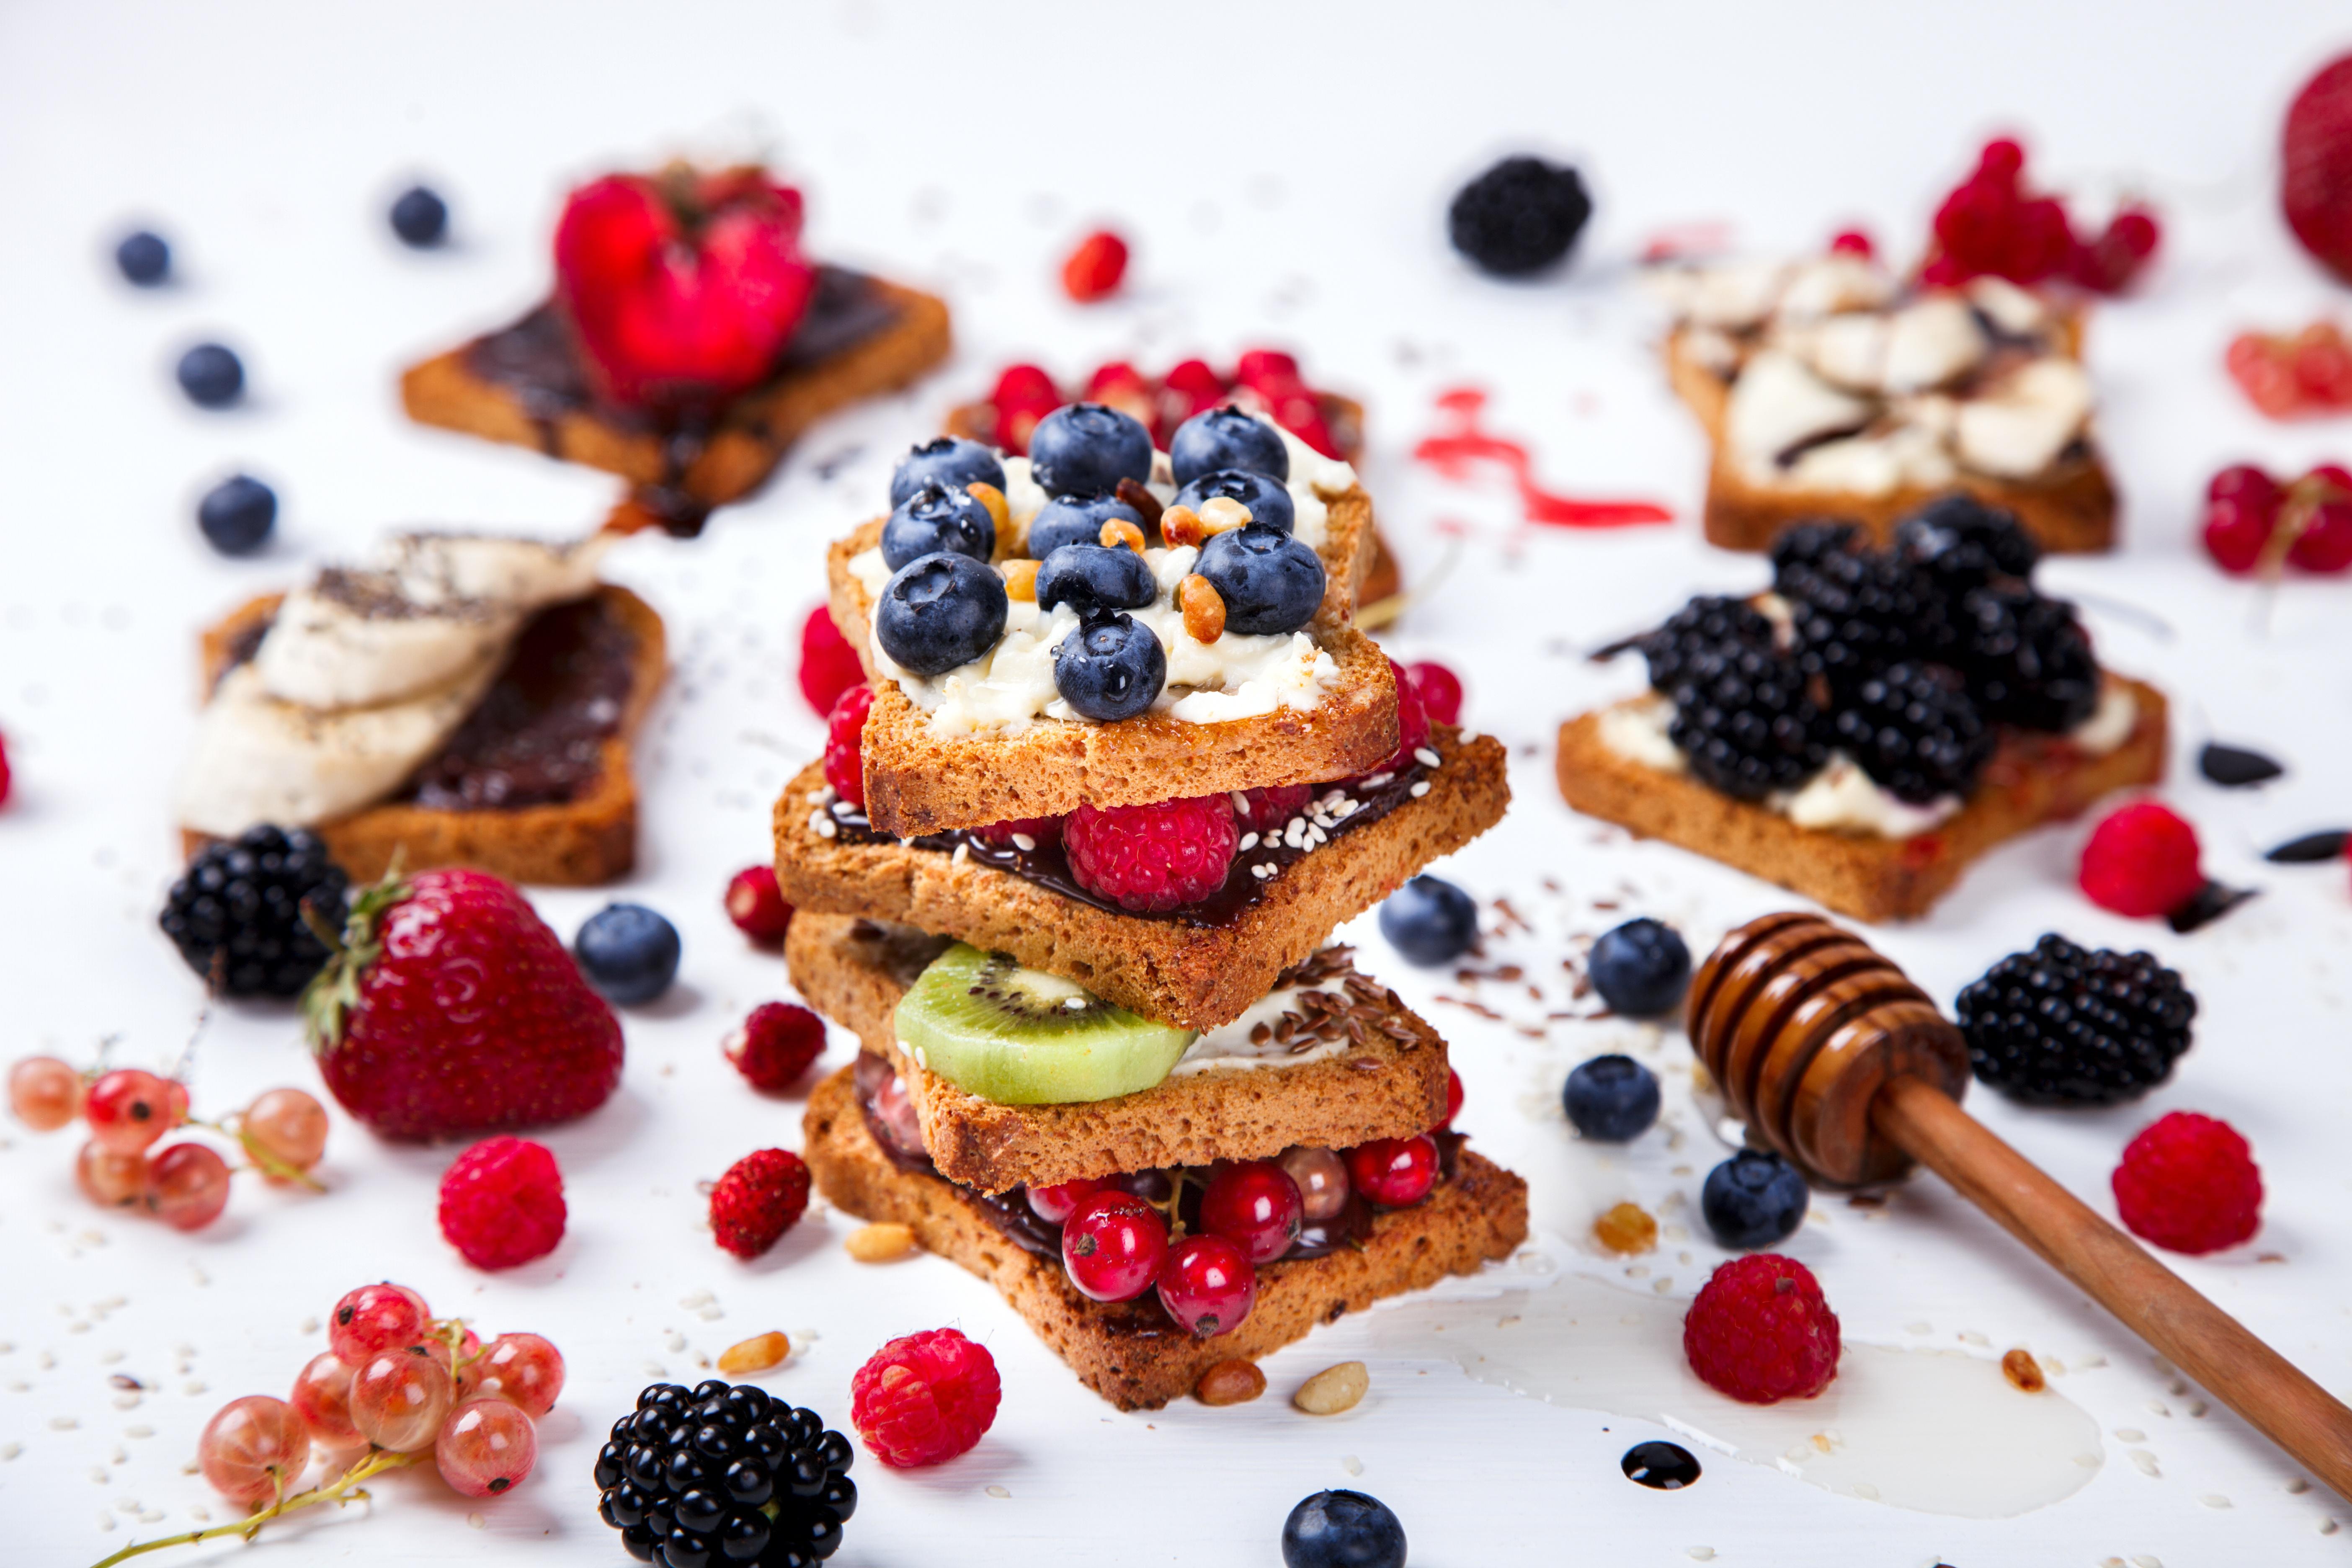 Berry Fruit Still Life Toast 5616x3744